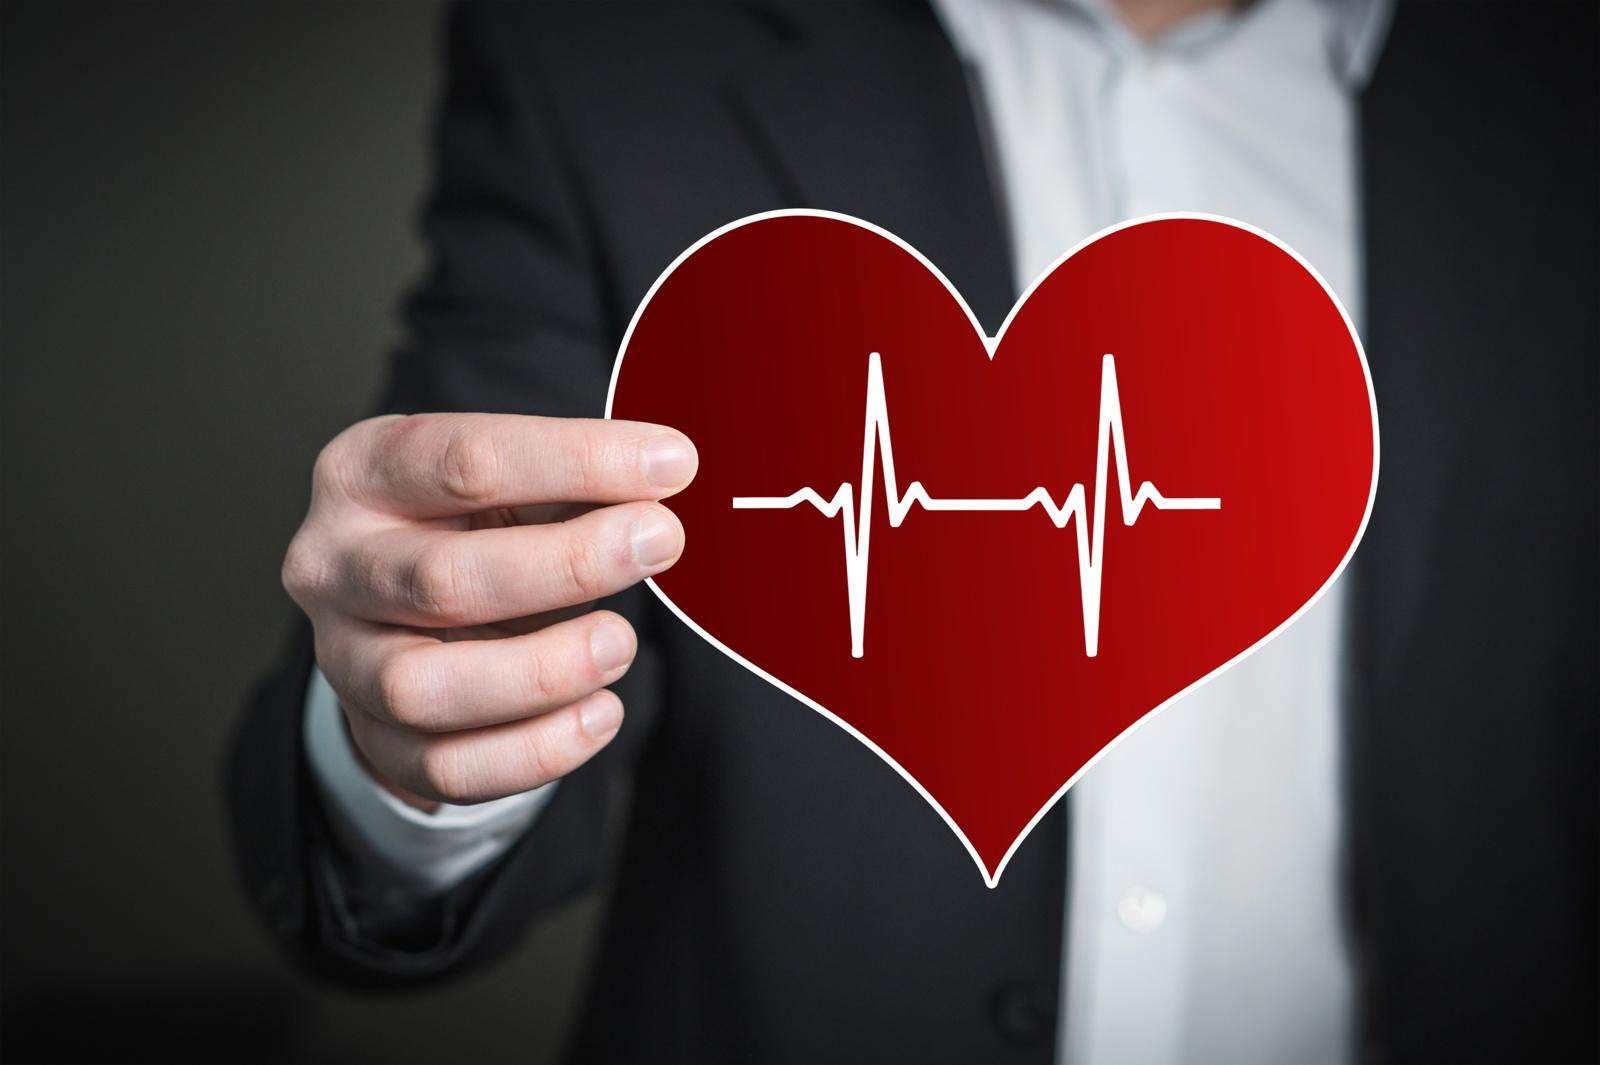 gudobelių kursas sergant hipertenzija